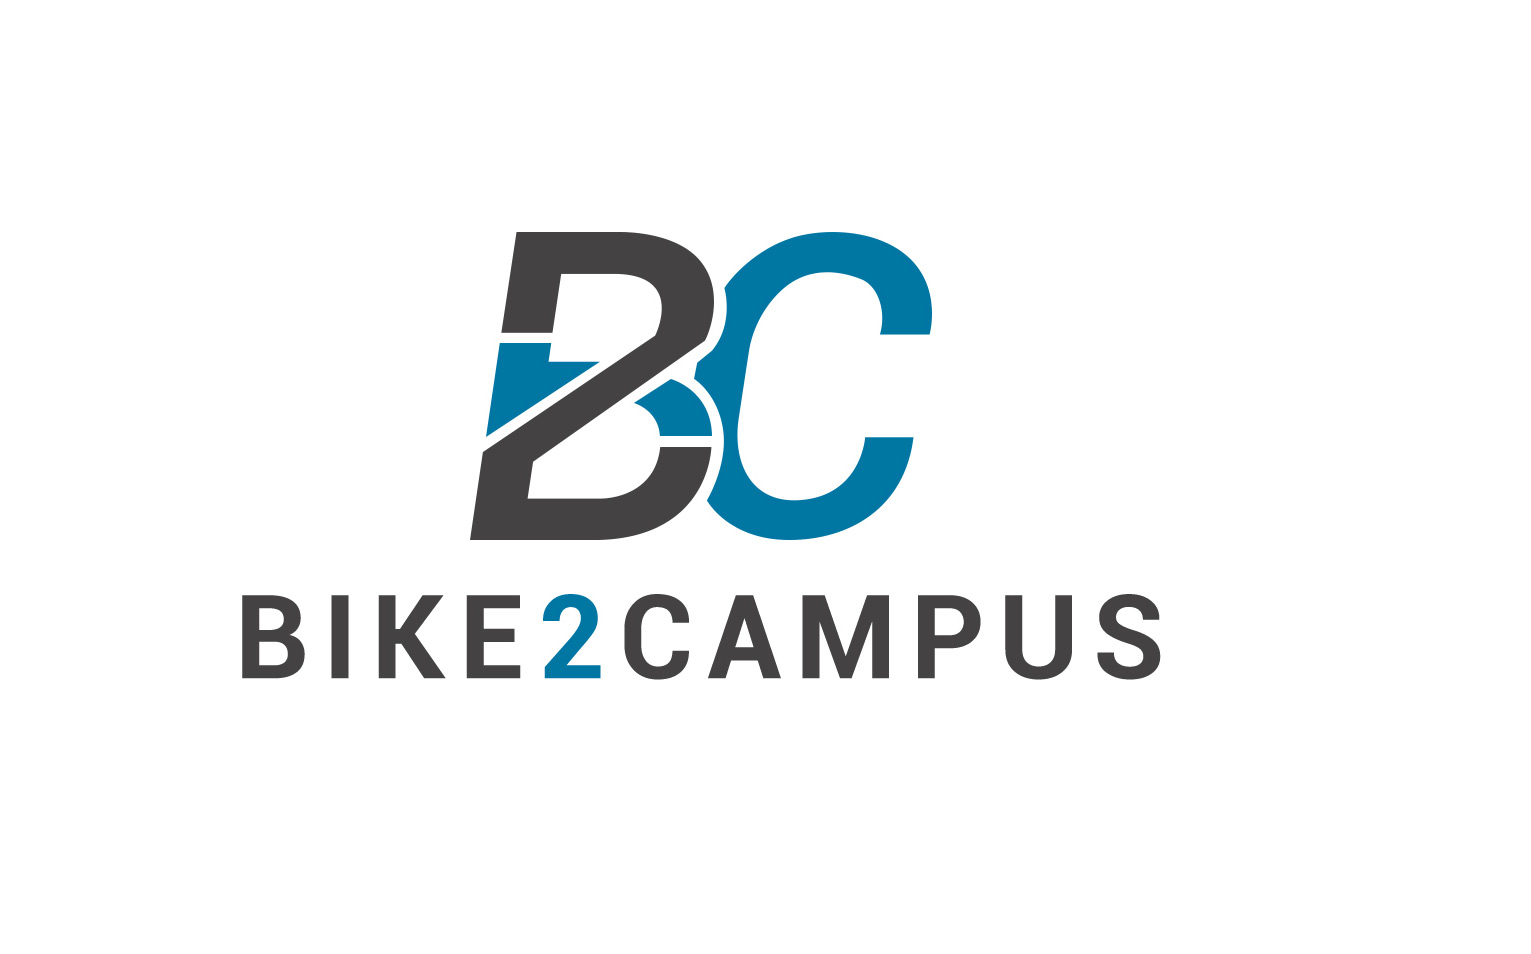 Bike2Campus